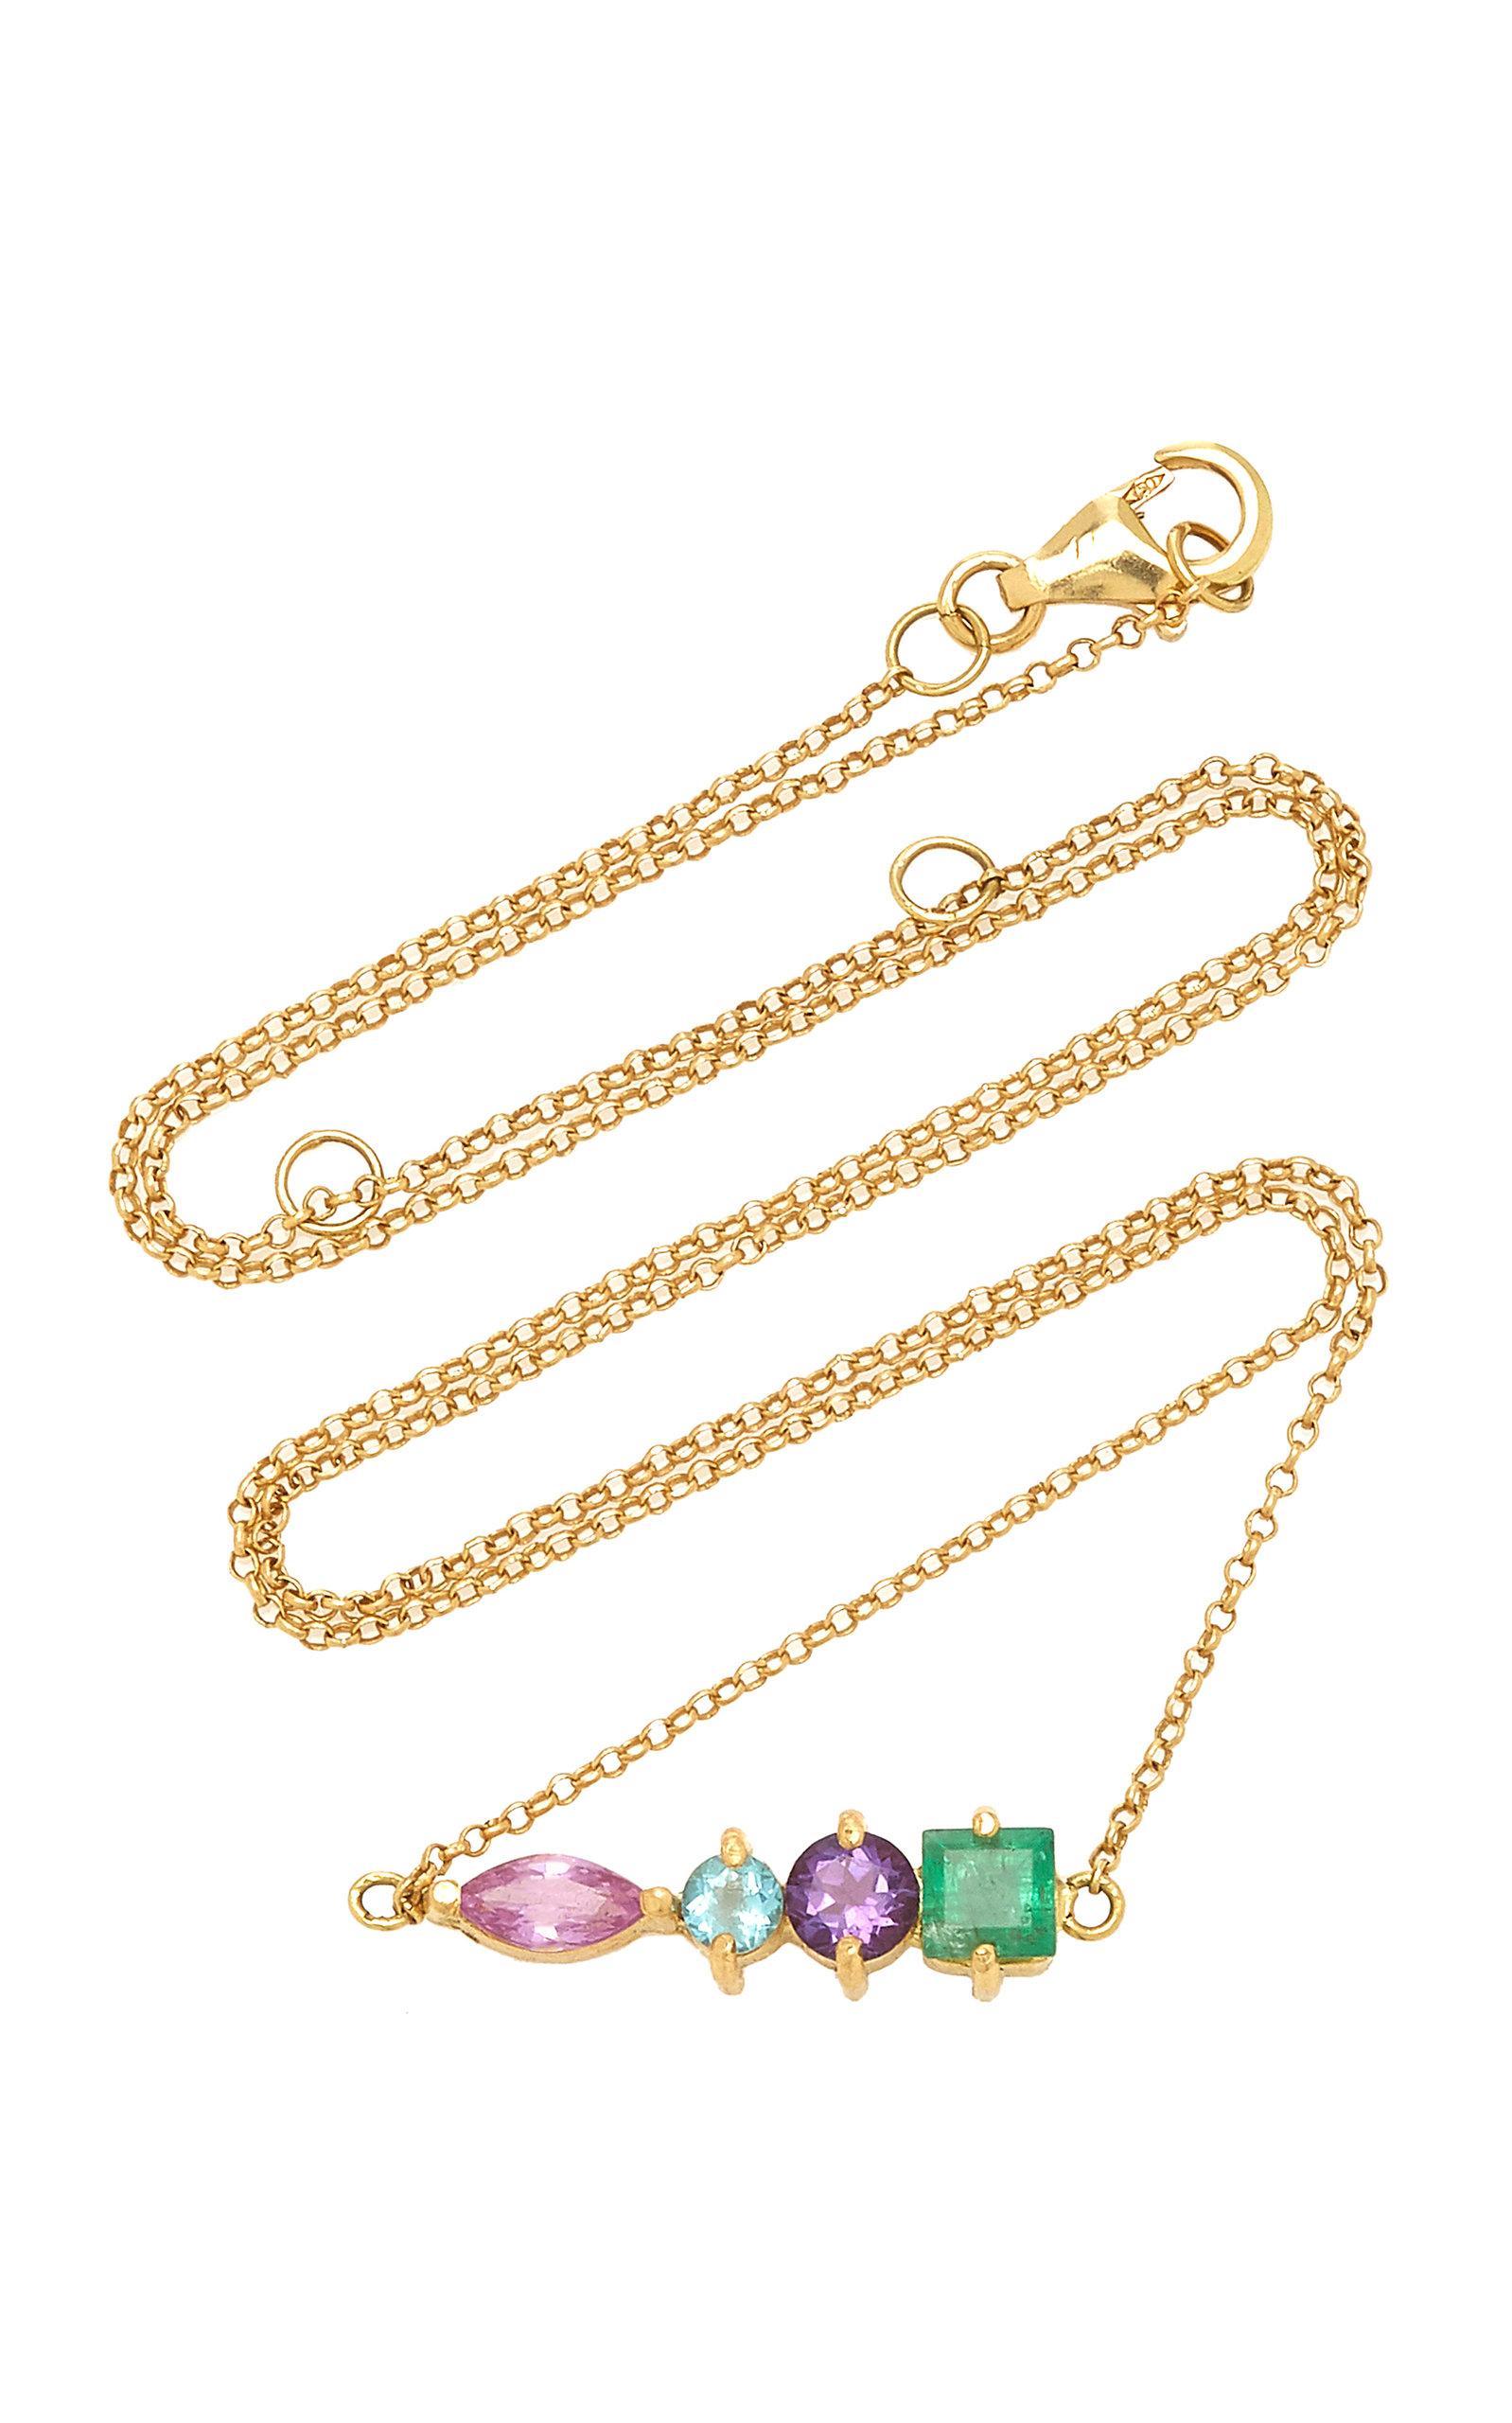 Women's 18K Yellow Gold Multi-Stone Necklace